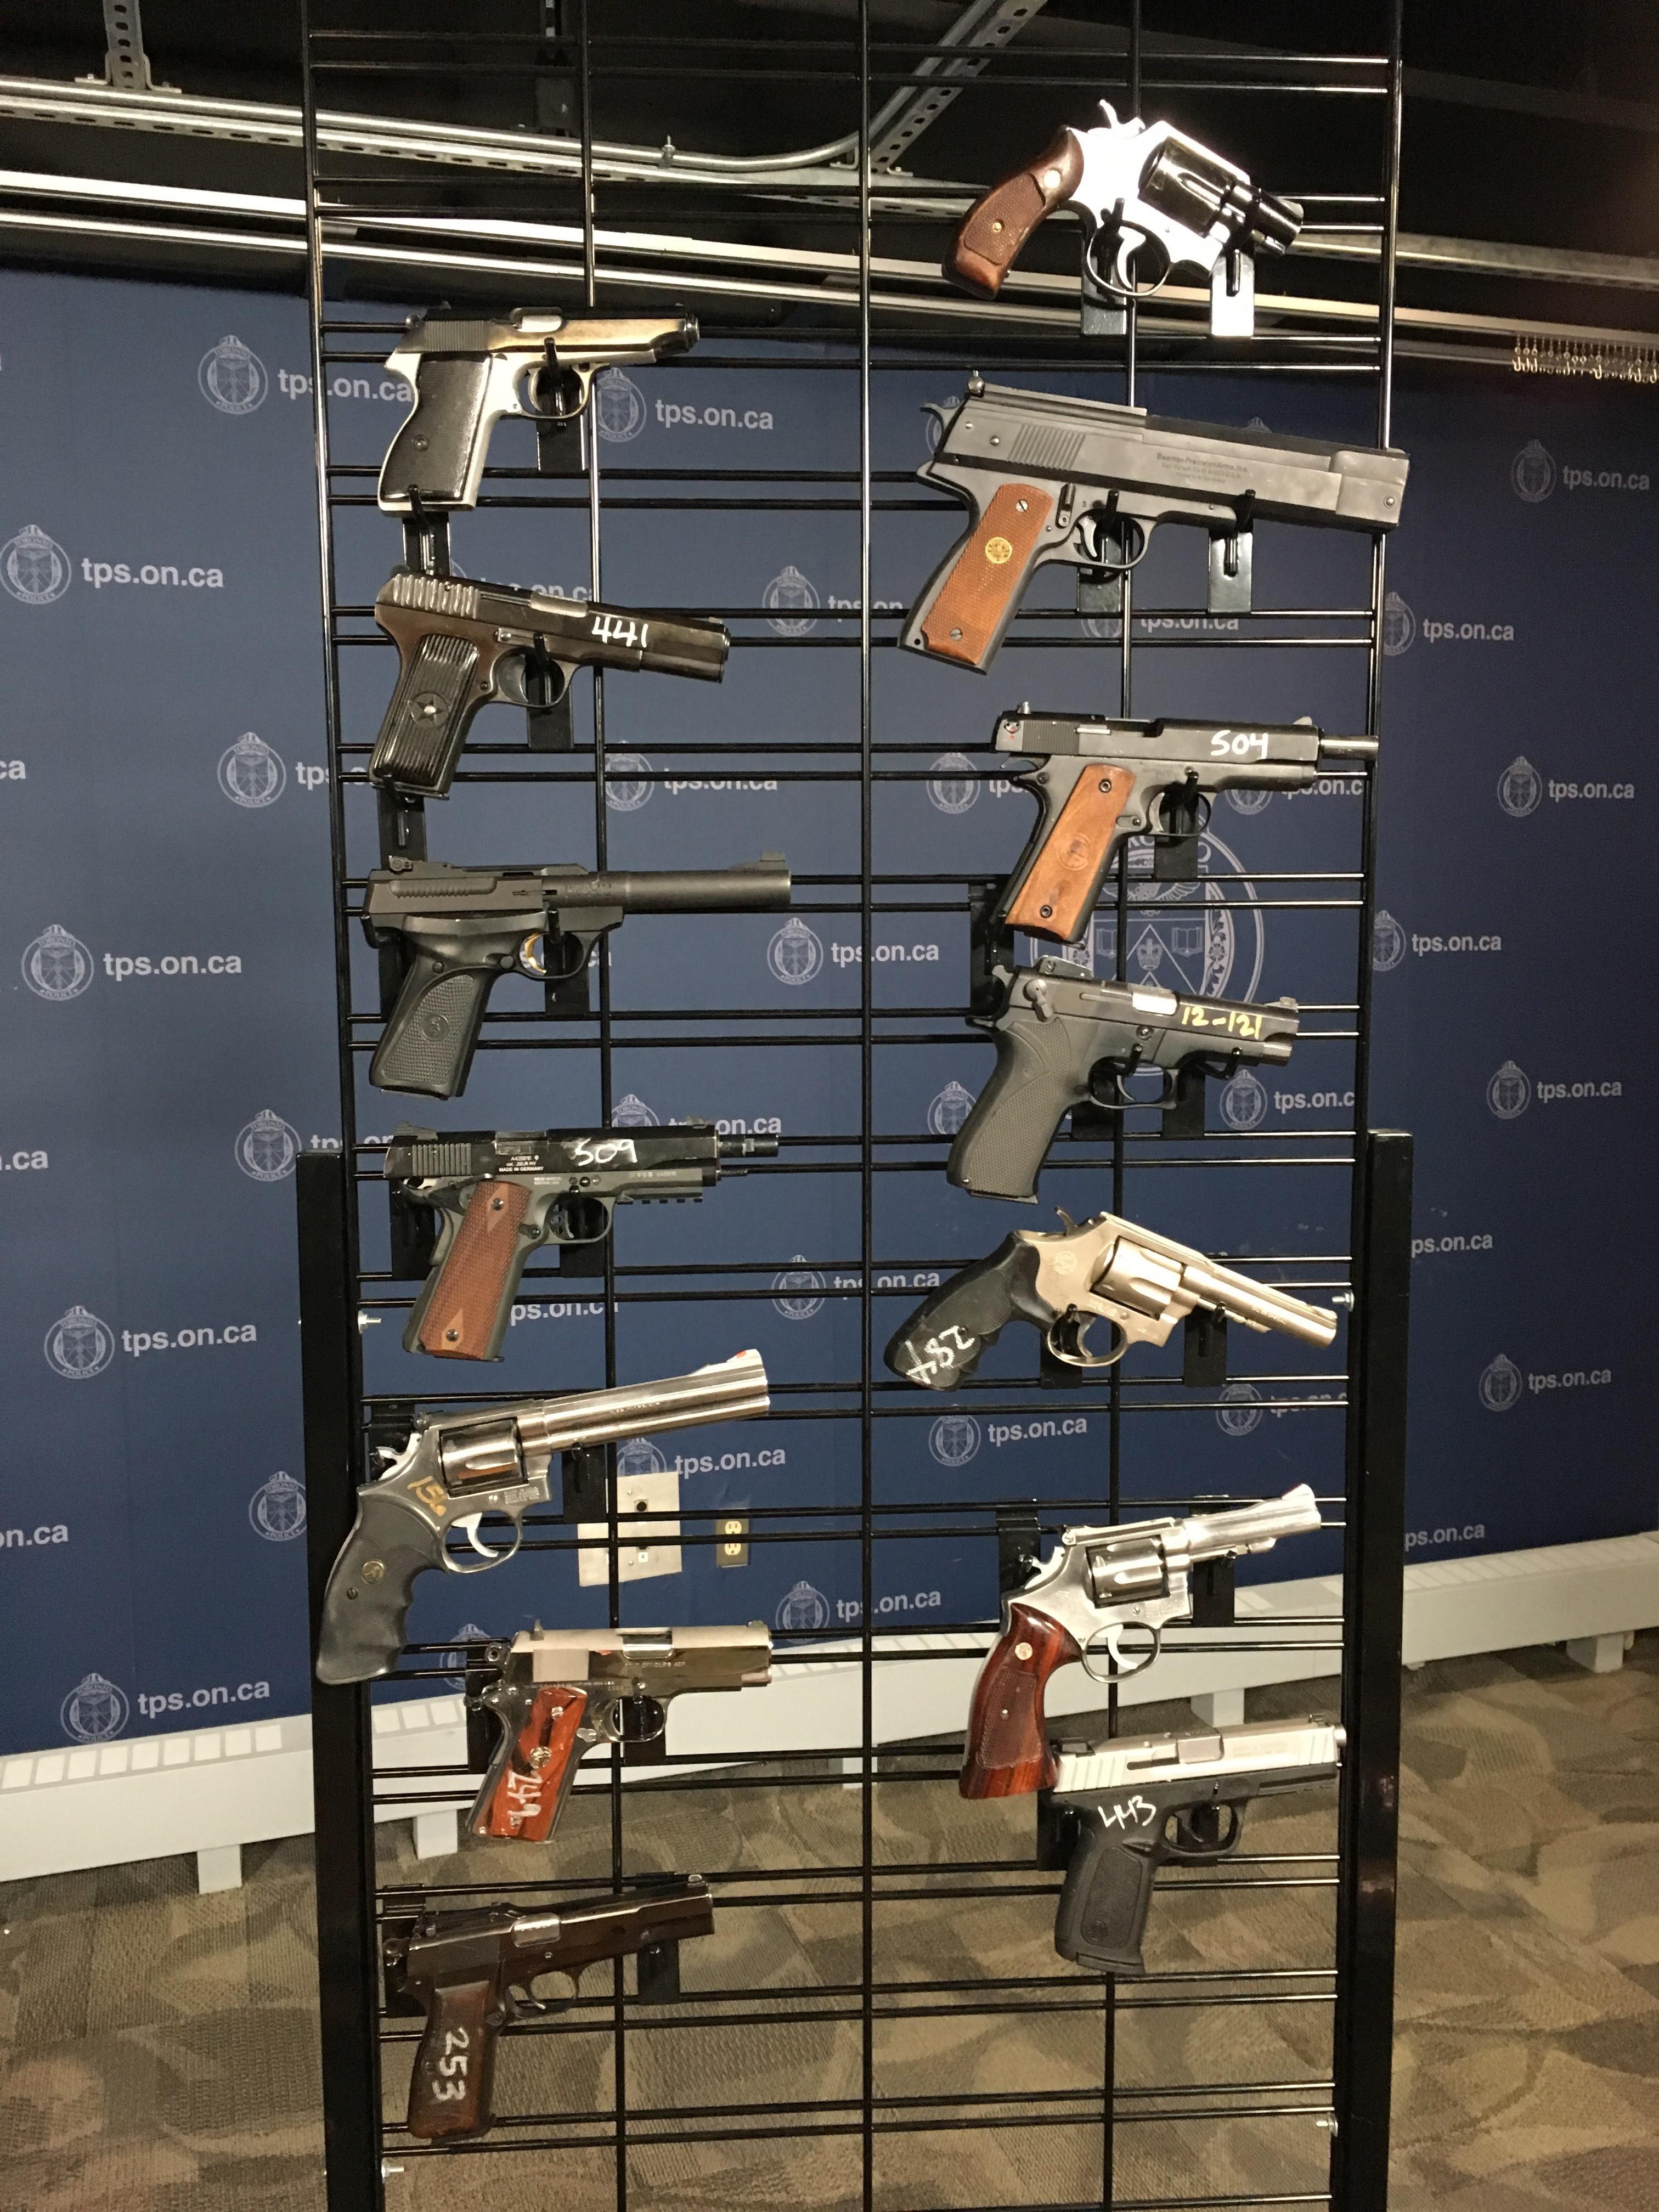 Over 3,100 guns surrendered to police during gun buyback program